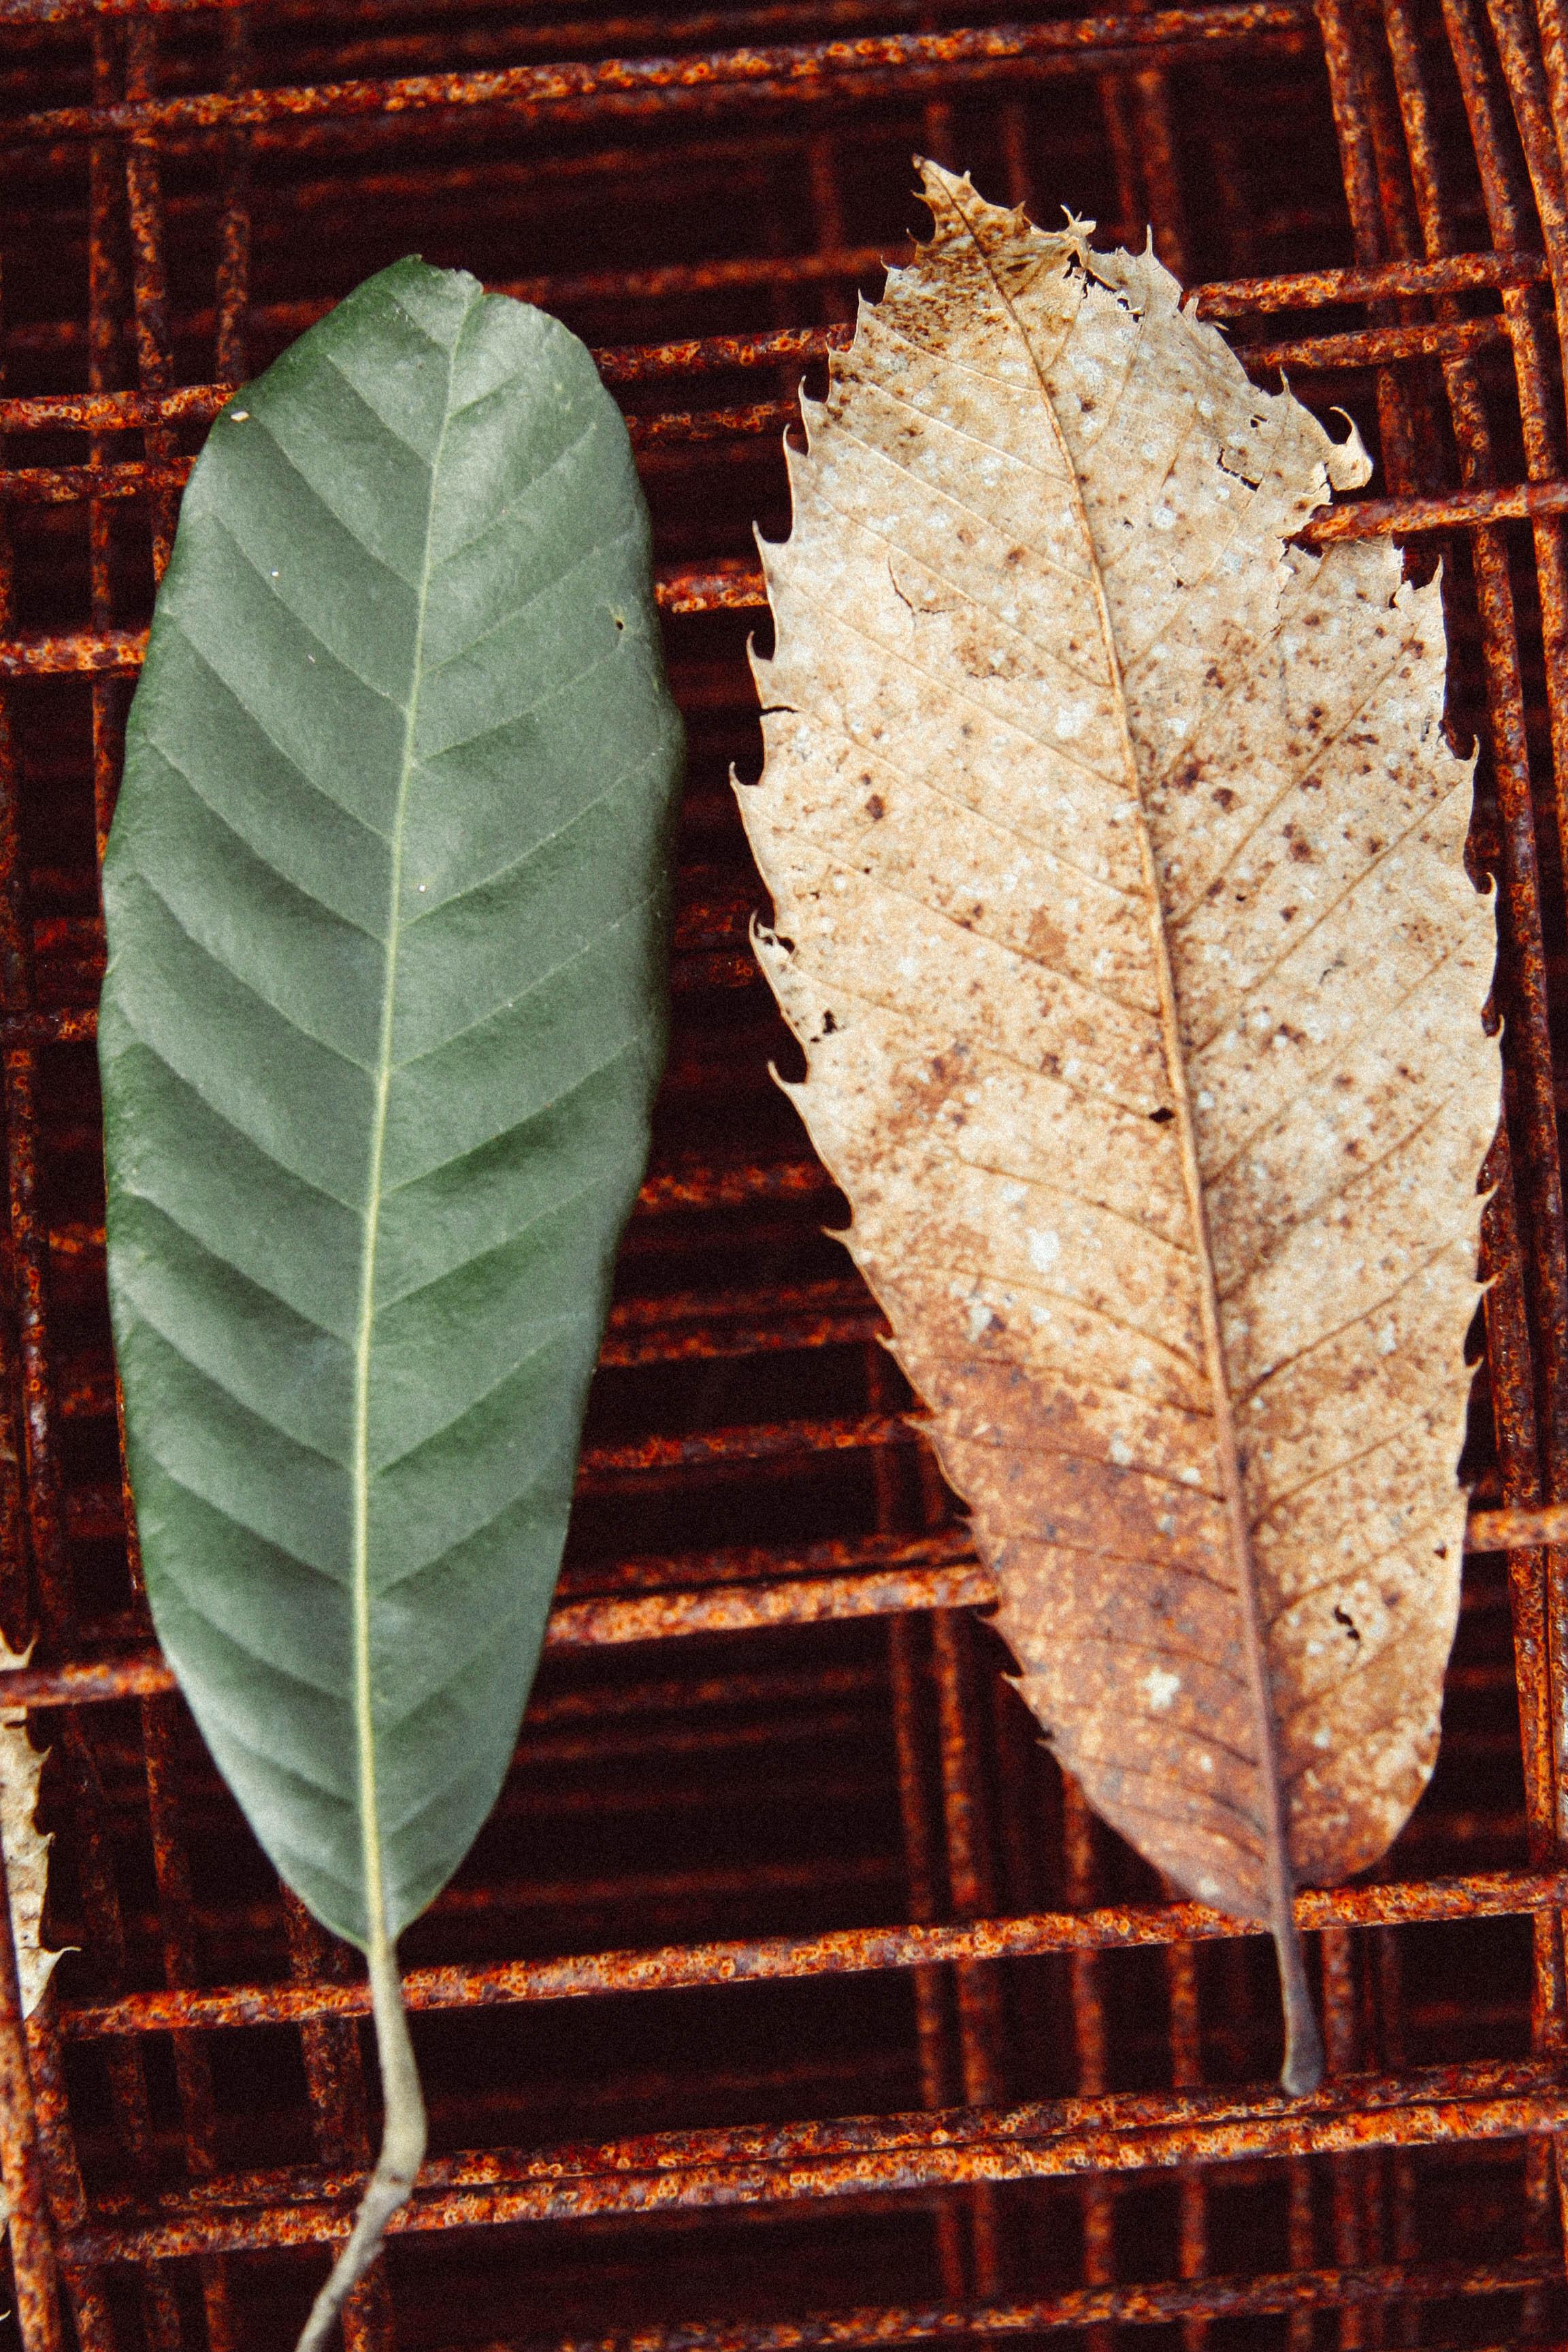 Tan Oak and Chestnut leaf comparison.